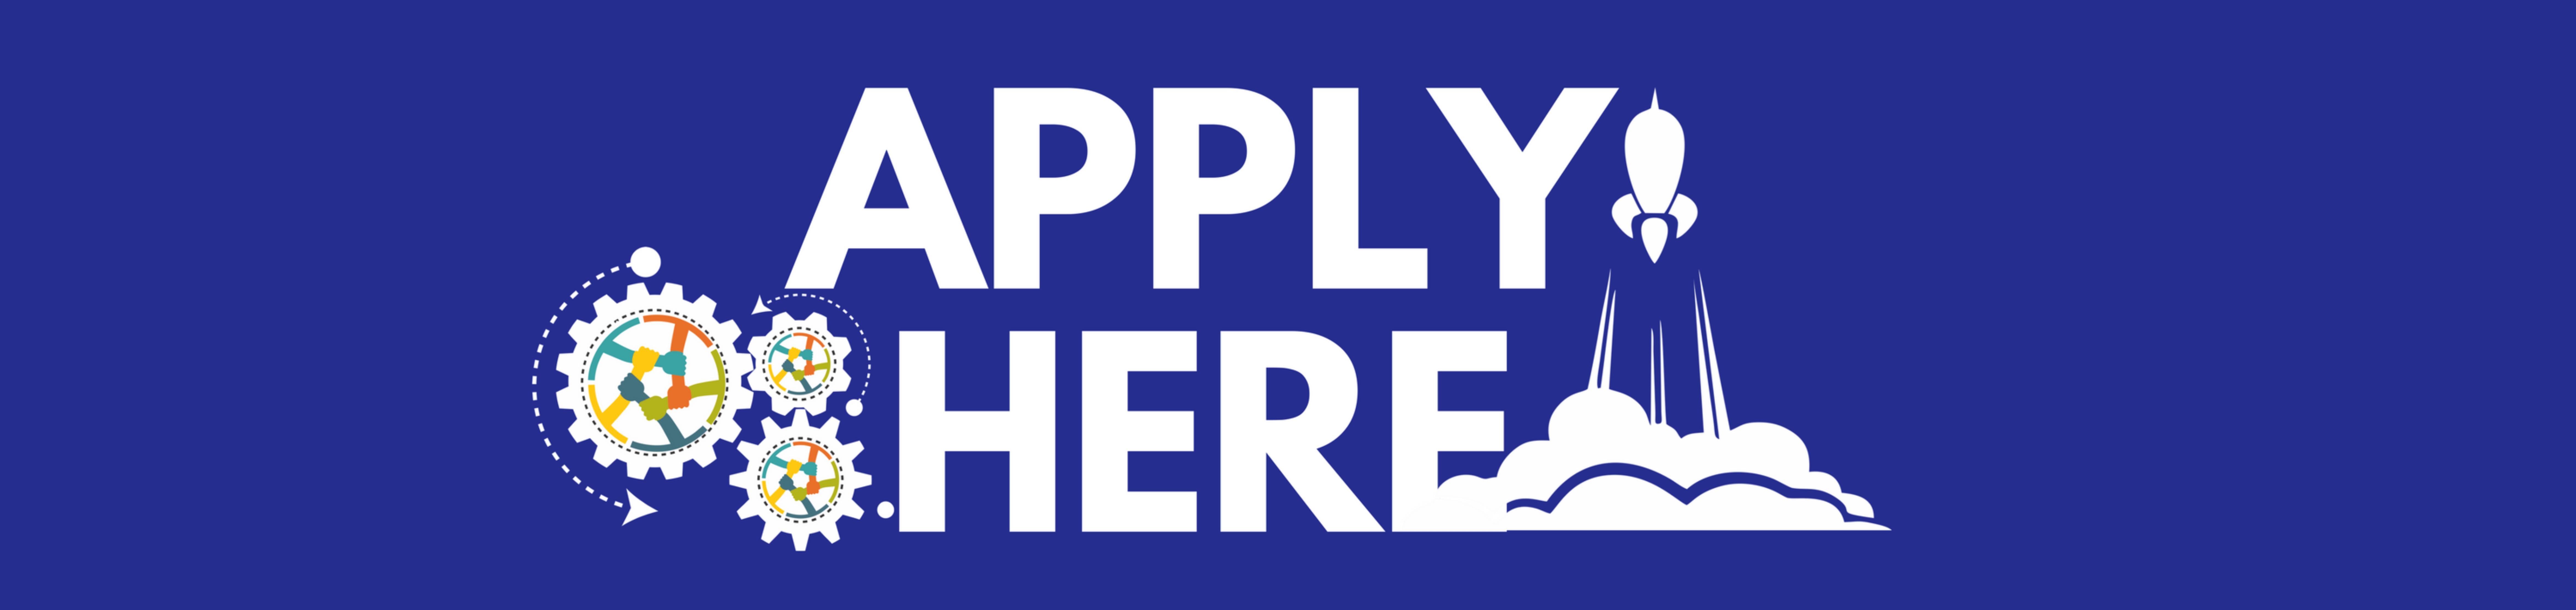 apply here45